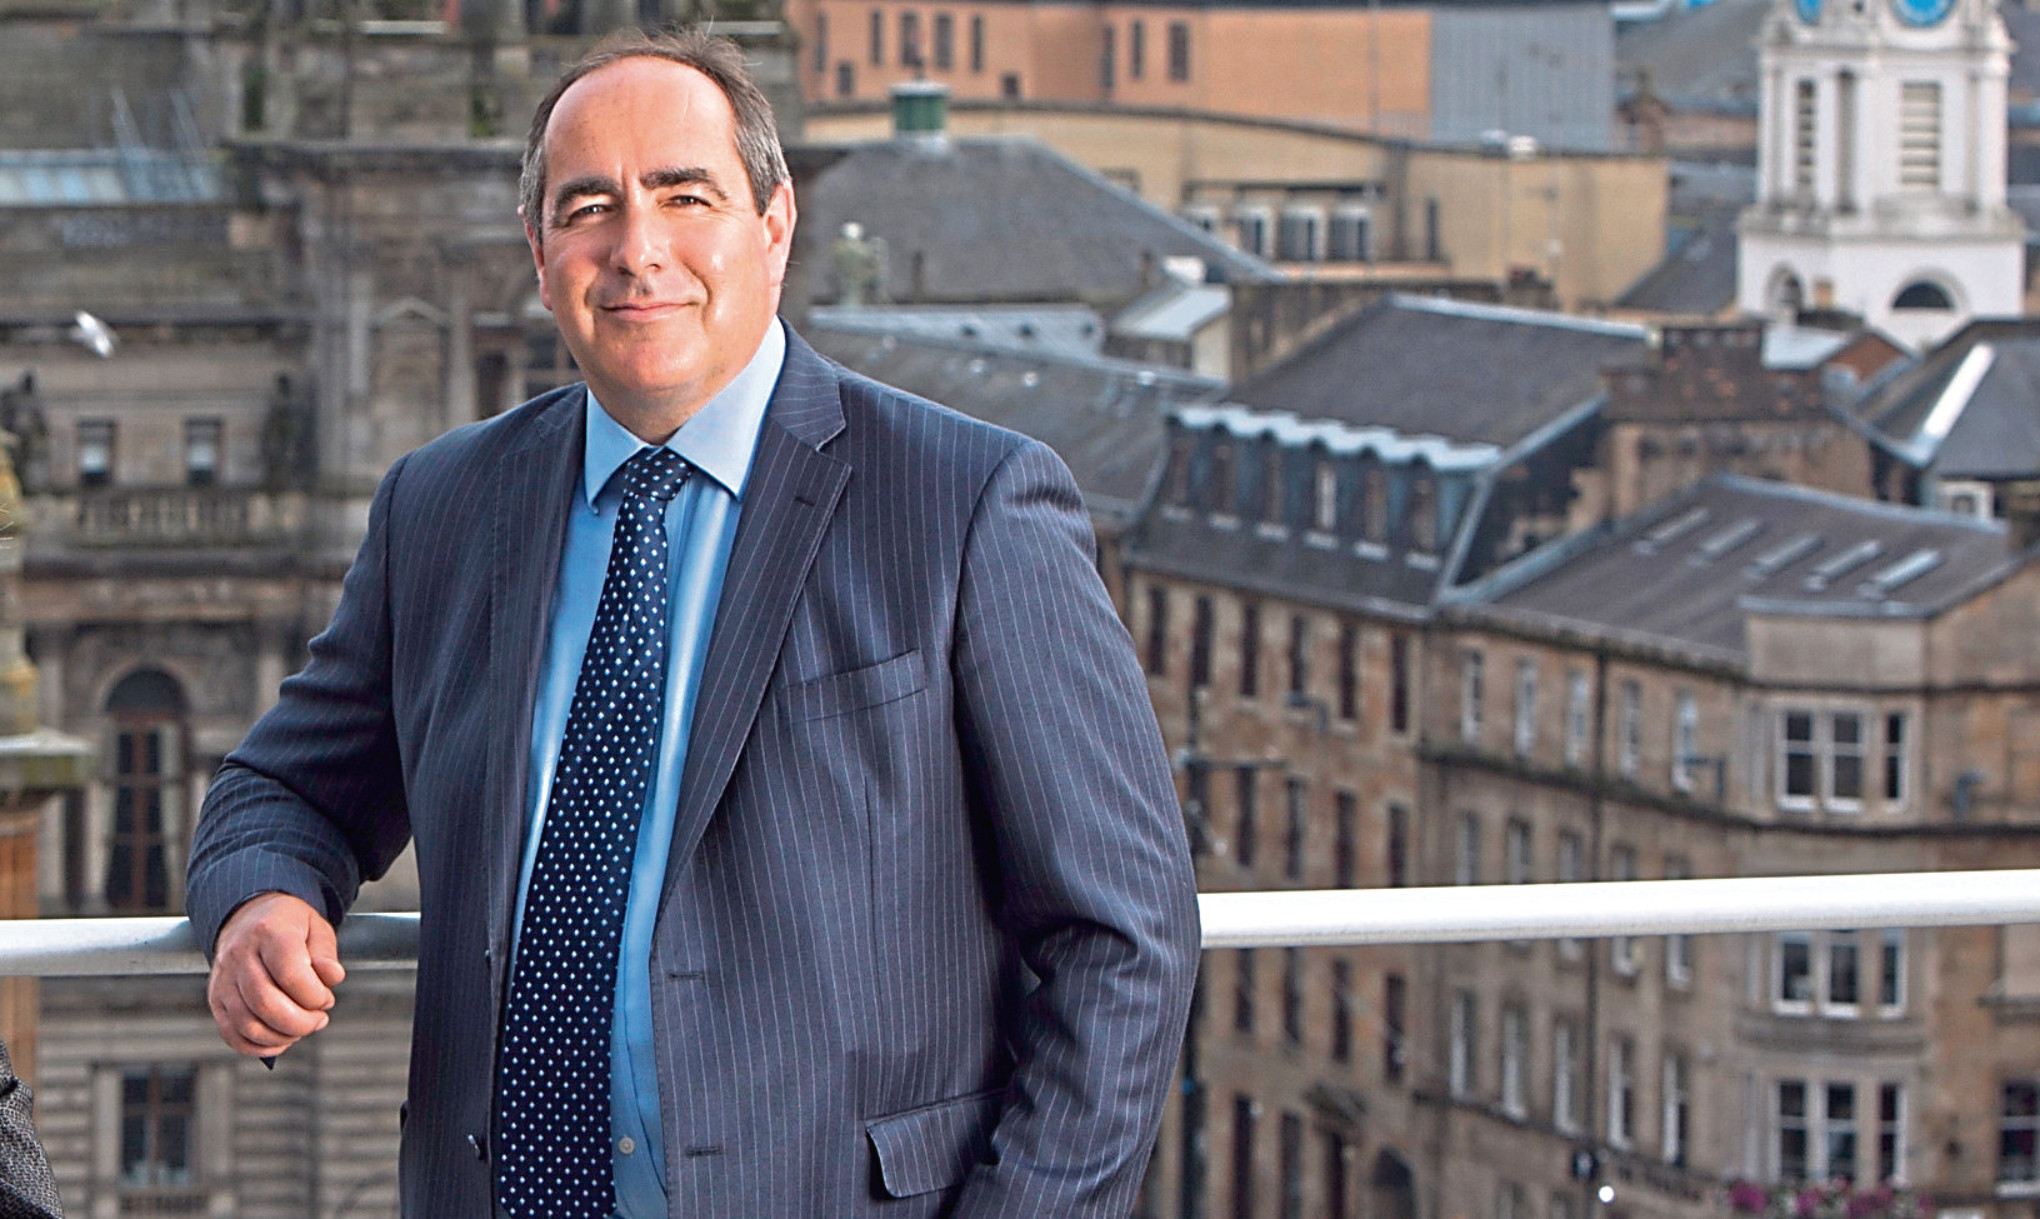 Blackadders managing partner Johnston Clark